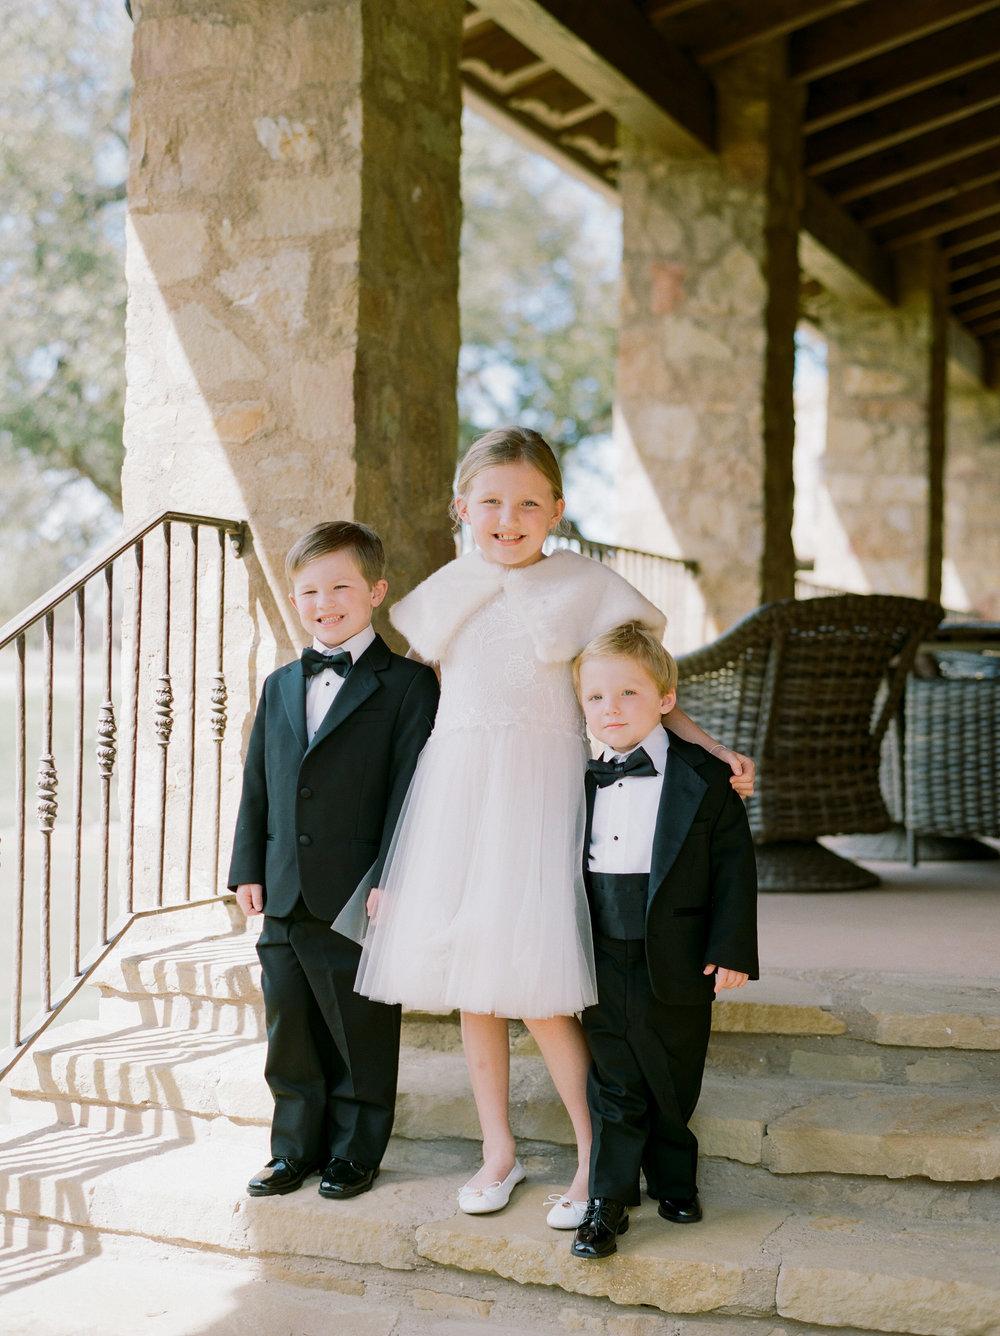 Escondido-Golf_Lake-Club-Hill-Country-Houston-Wedding-Photographer-Best-Top-Luxury-Destination-Engagements-Portrait-Austin-Photography-42.jpg